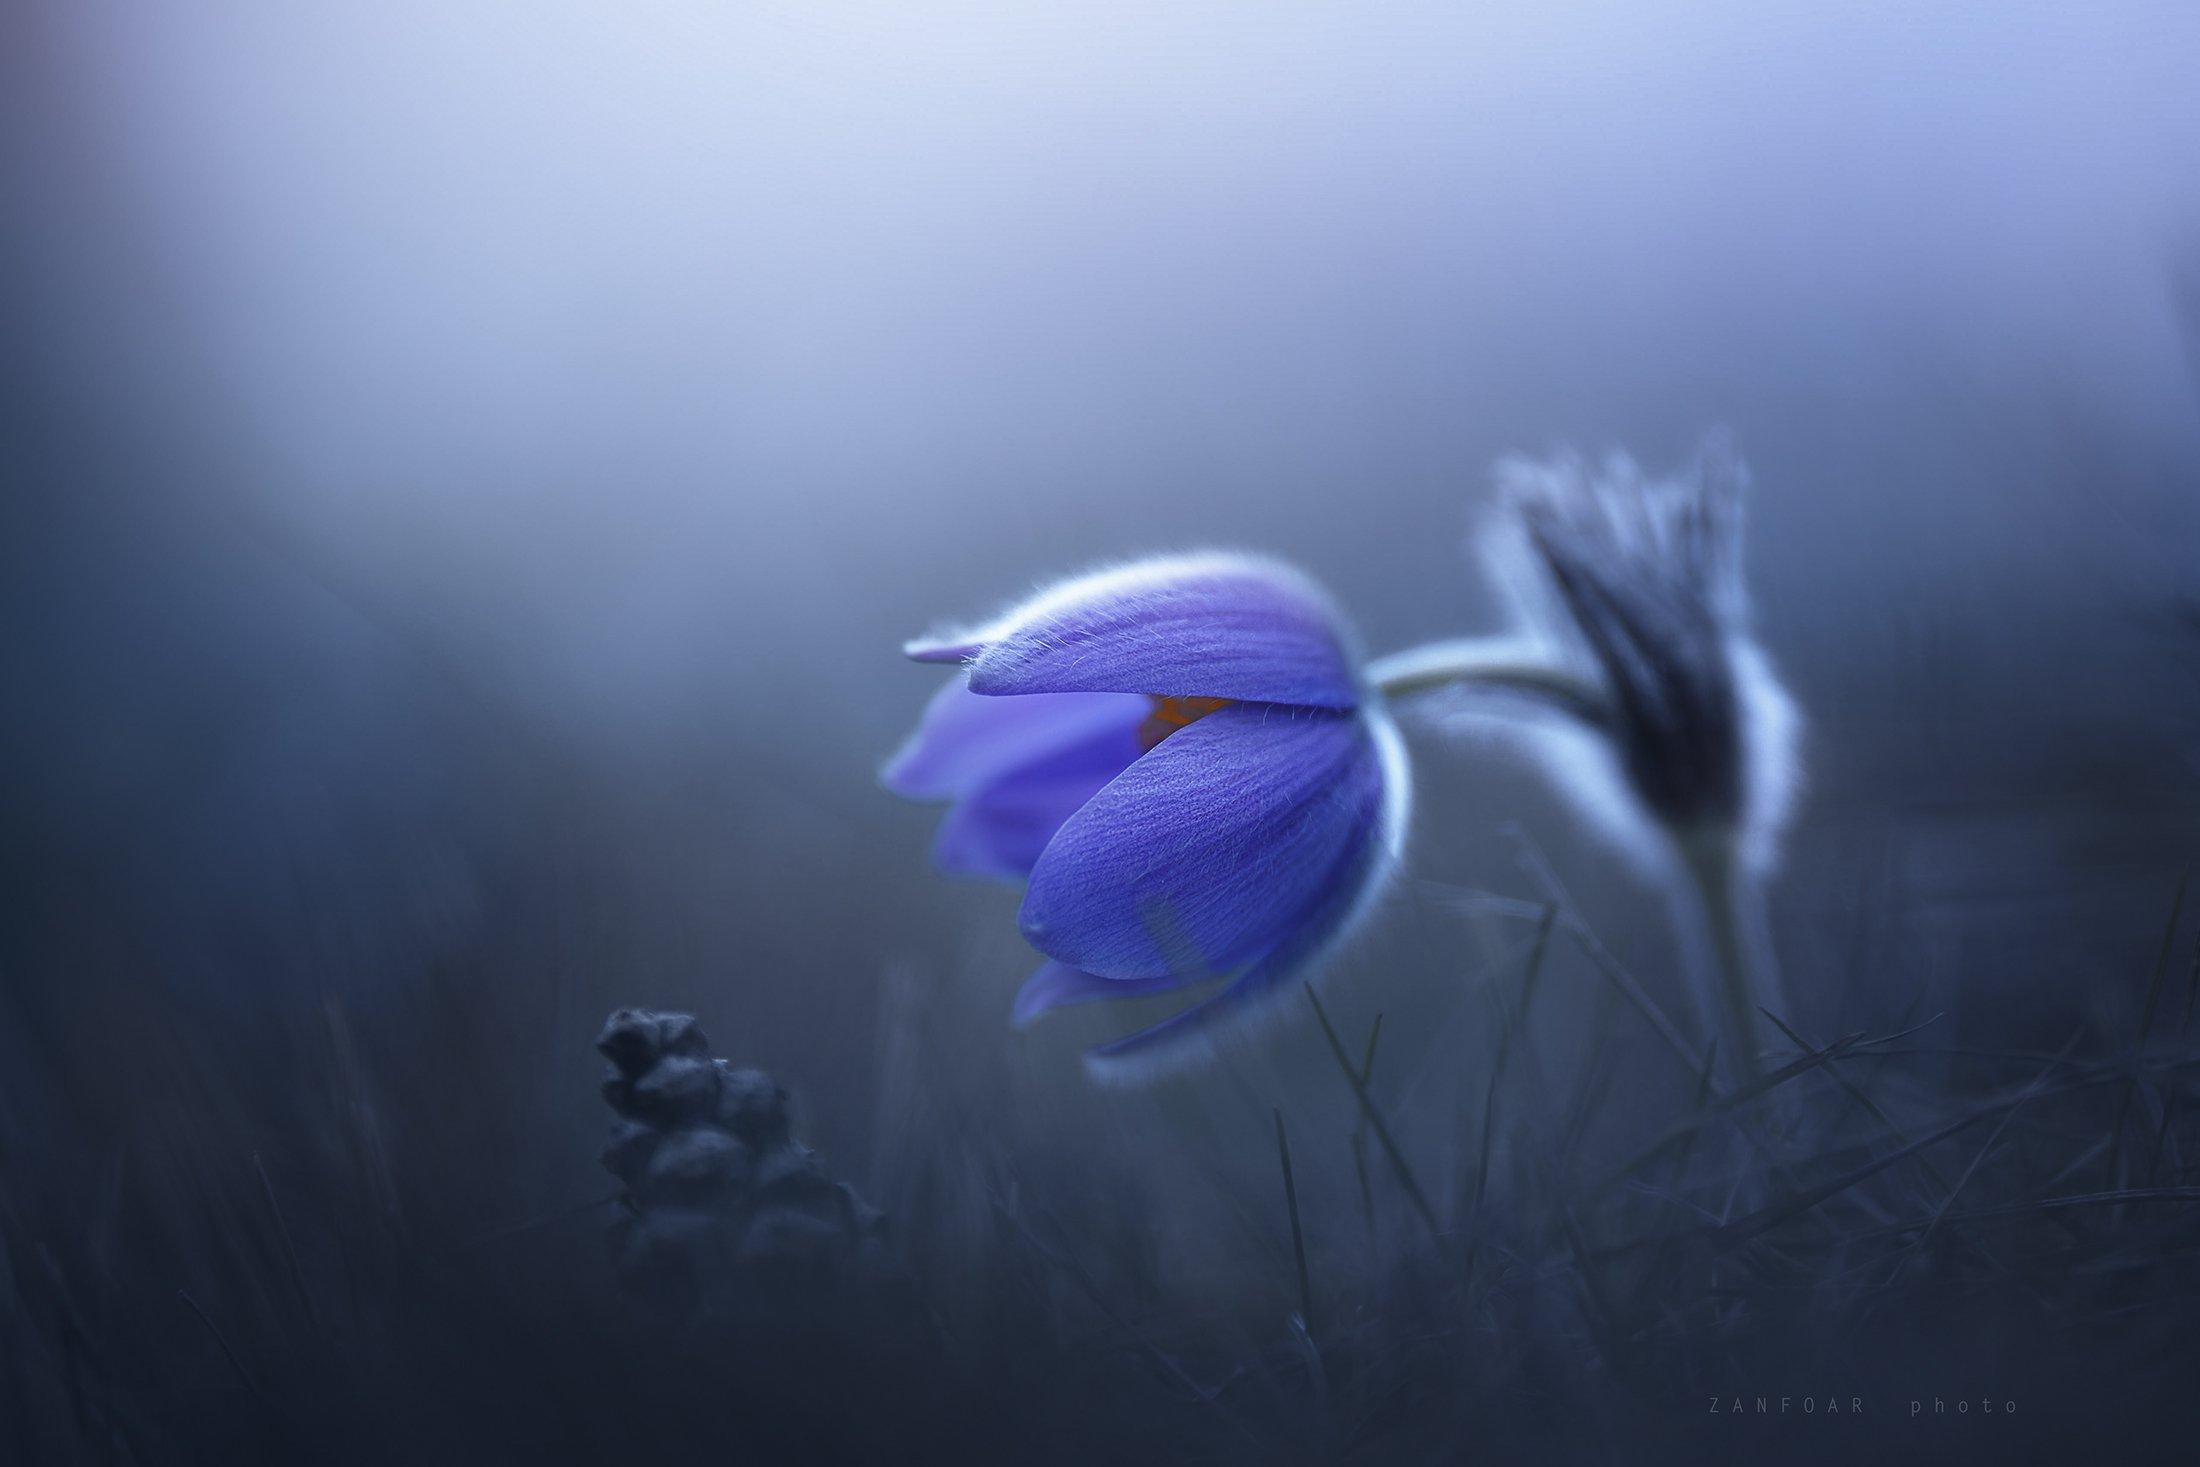 мистический цветок,цветок,zanfoar,nikon d750,czech republic,czechia,чехия,pulsatilla grandis,koniklec velkokvětý,пульсатилла (pulsatilla grandis), Zanfoar